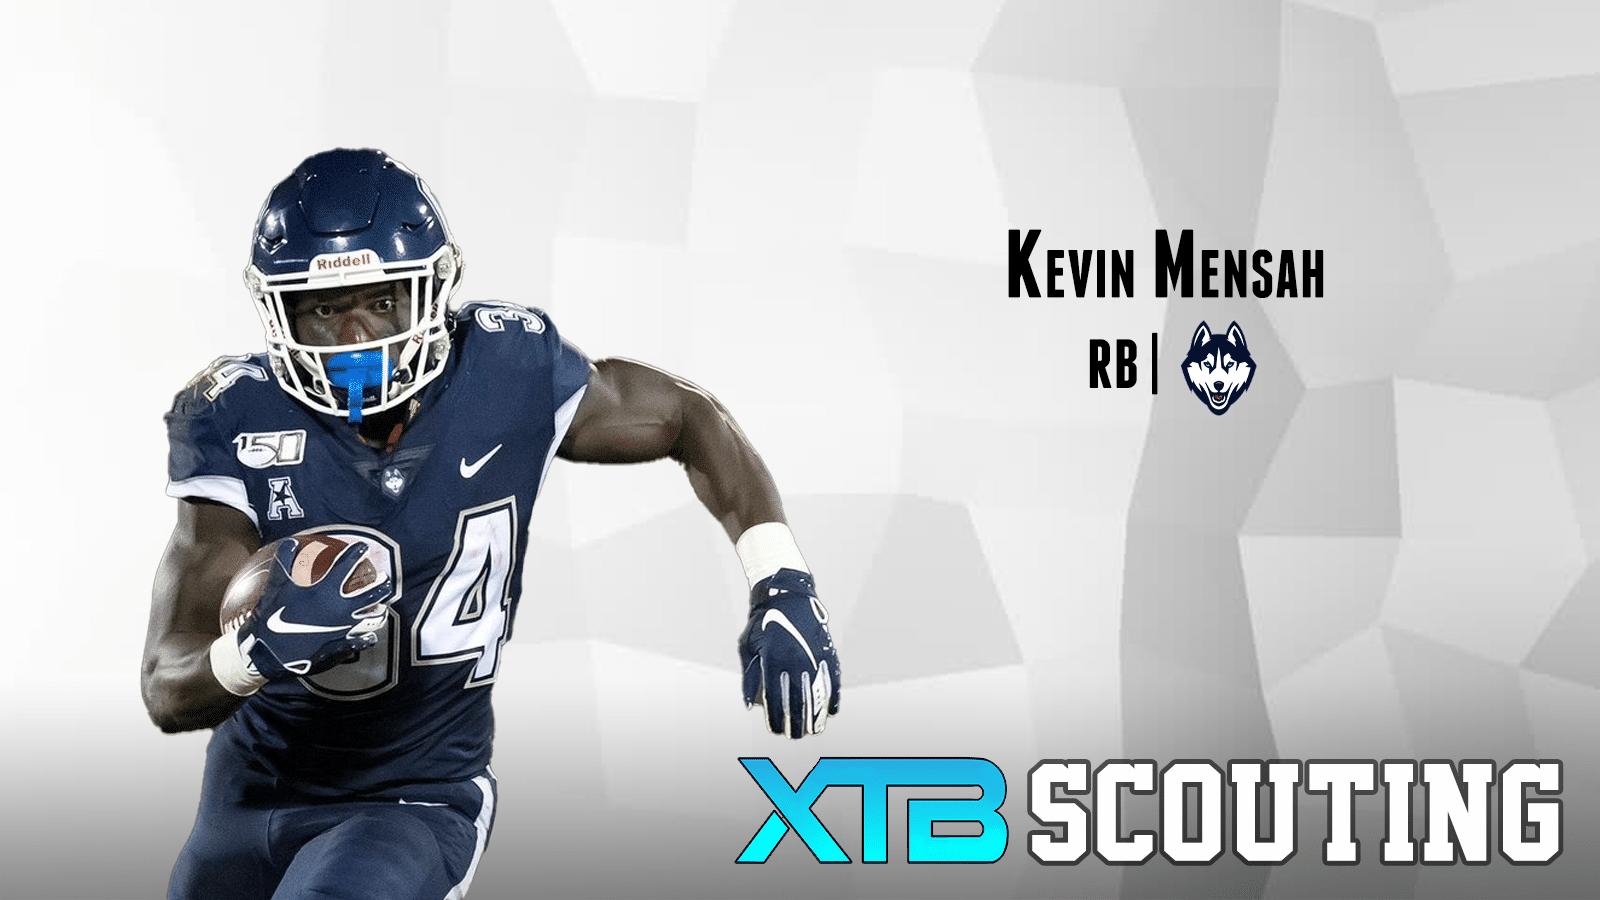 Kevin Mensah